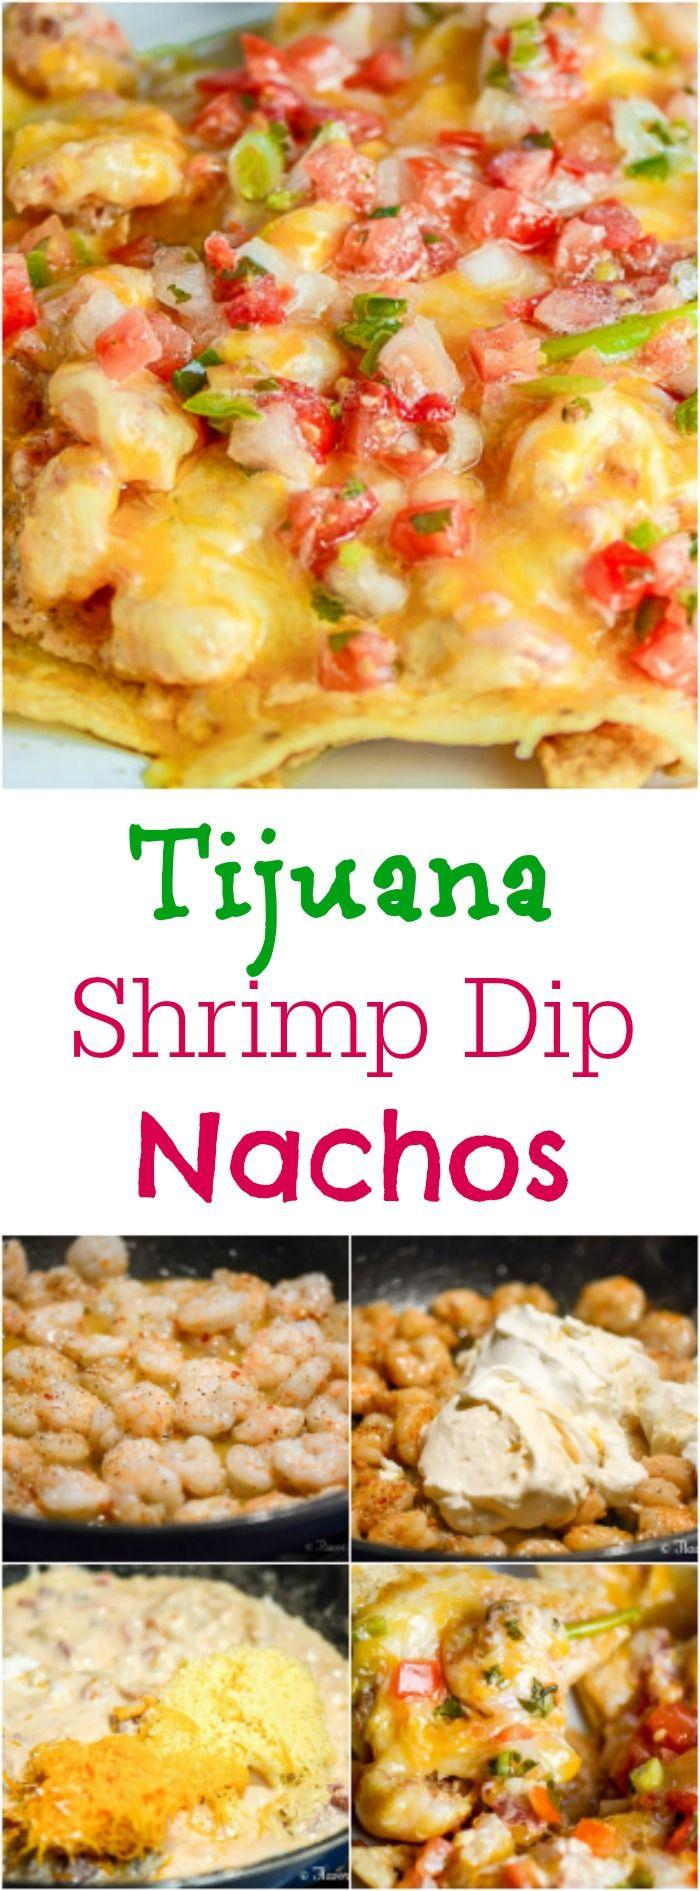 Tijuana Shrimp Dip Nachos are a cheesy, creamy, spicy, and crunchy appetizer. ~ http://FlavorMosaic.com